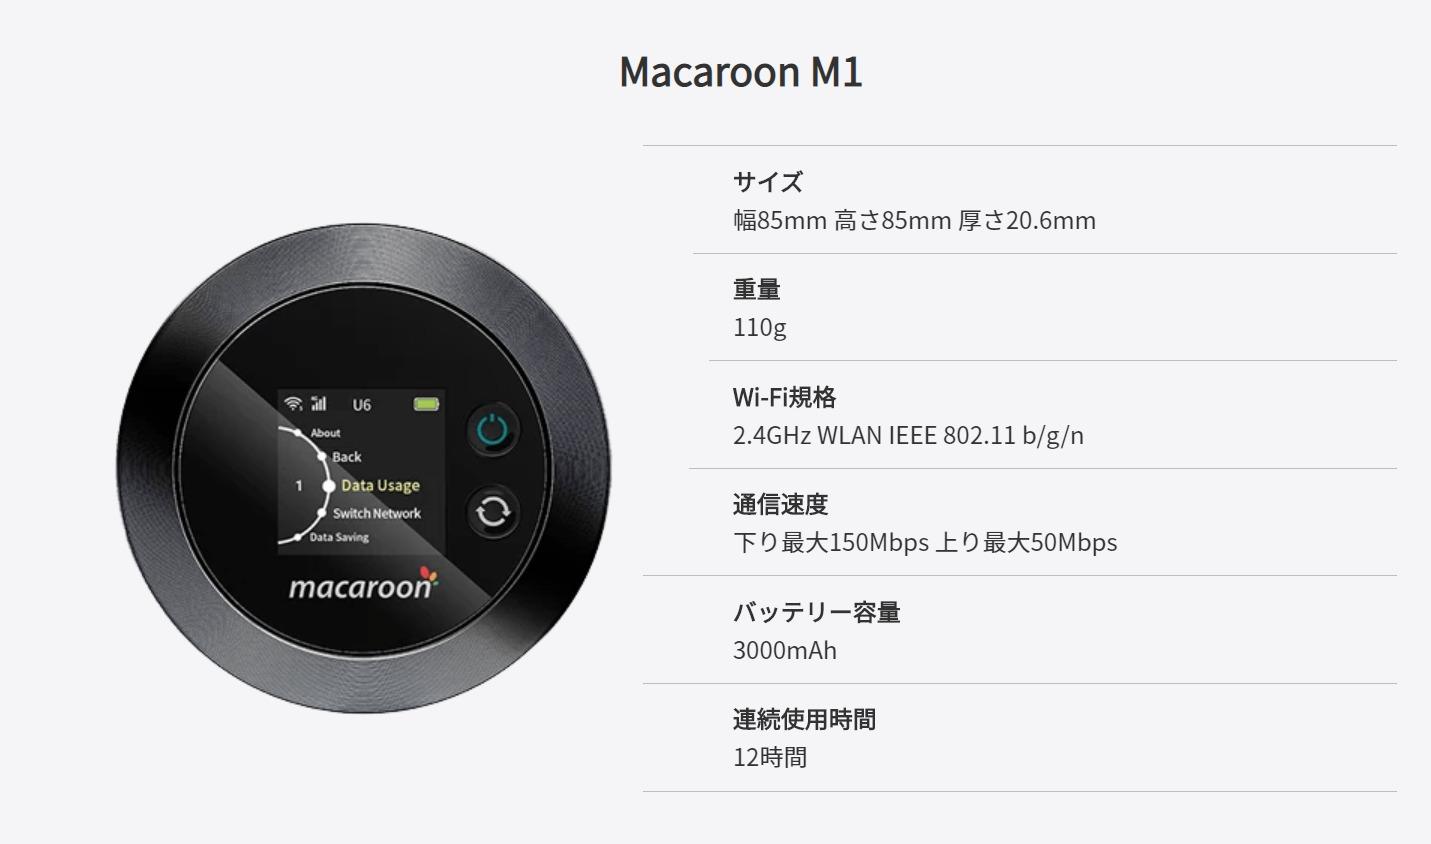 MONSTER MOBILE の端末「Macaroon M1」